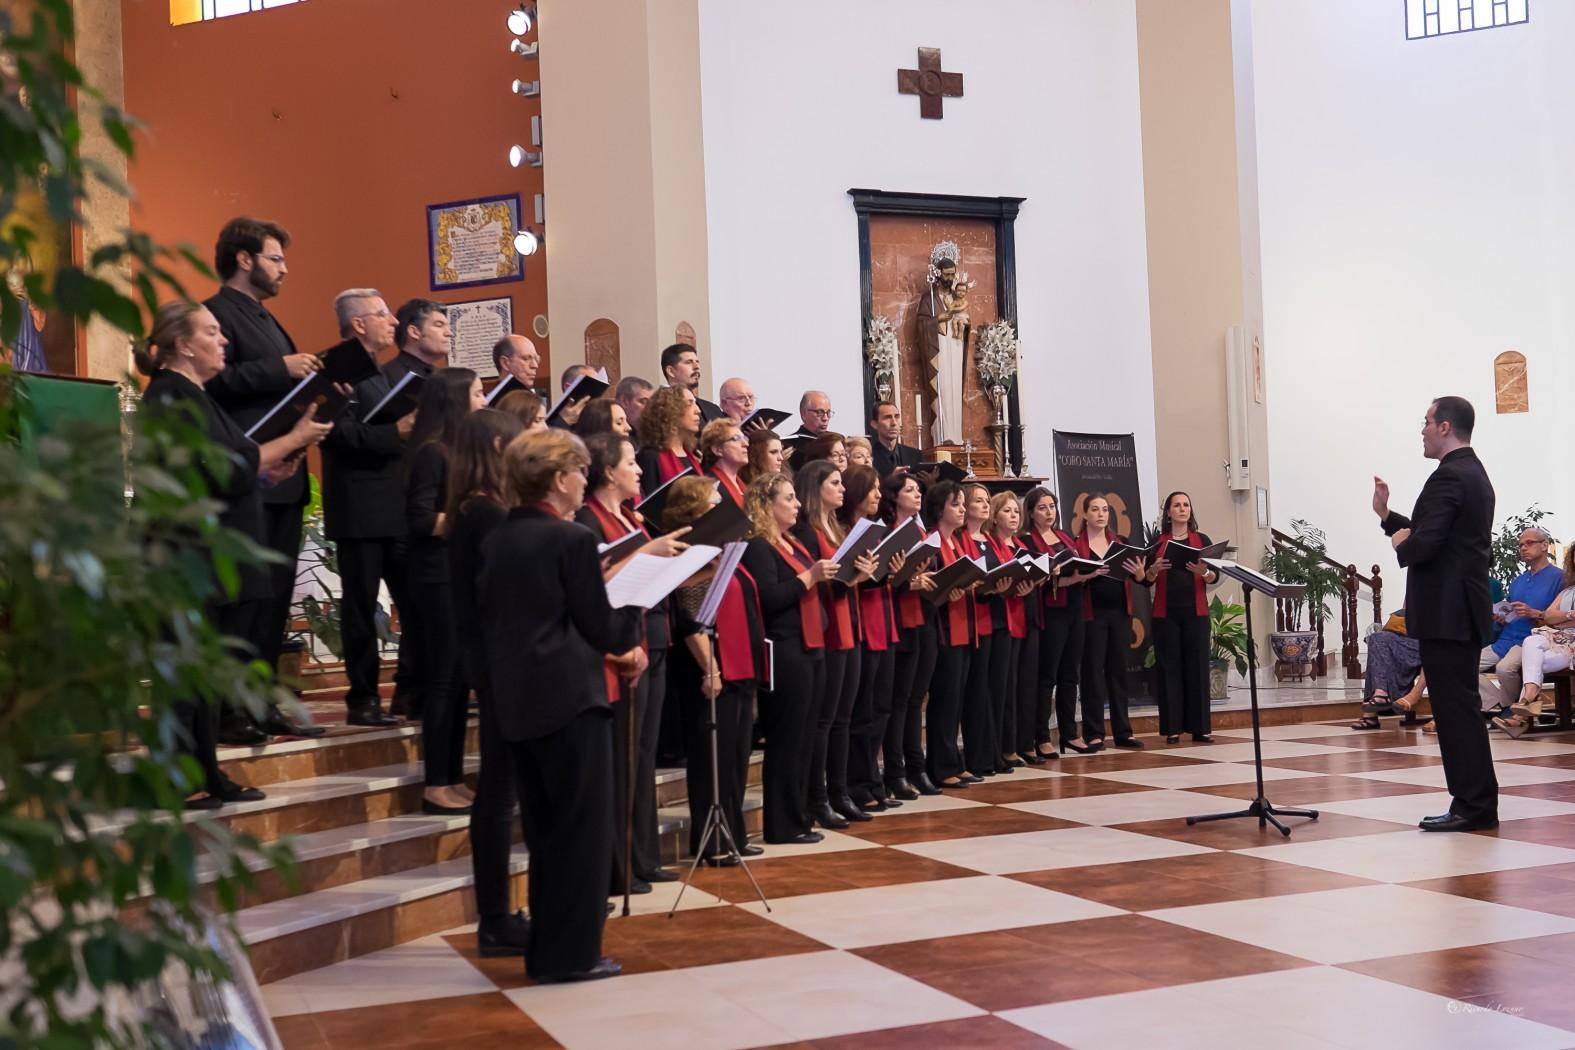 018-coro-santa-maria-180616-5201